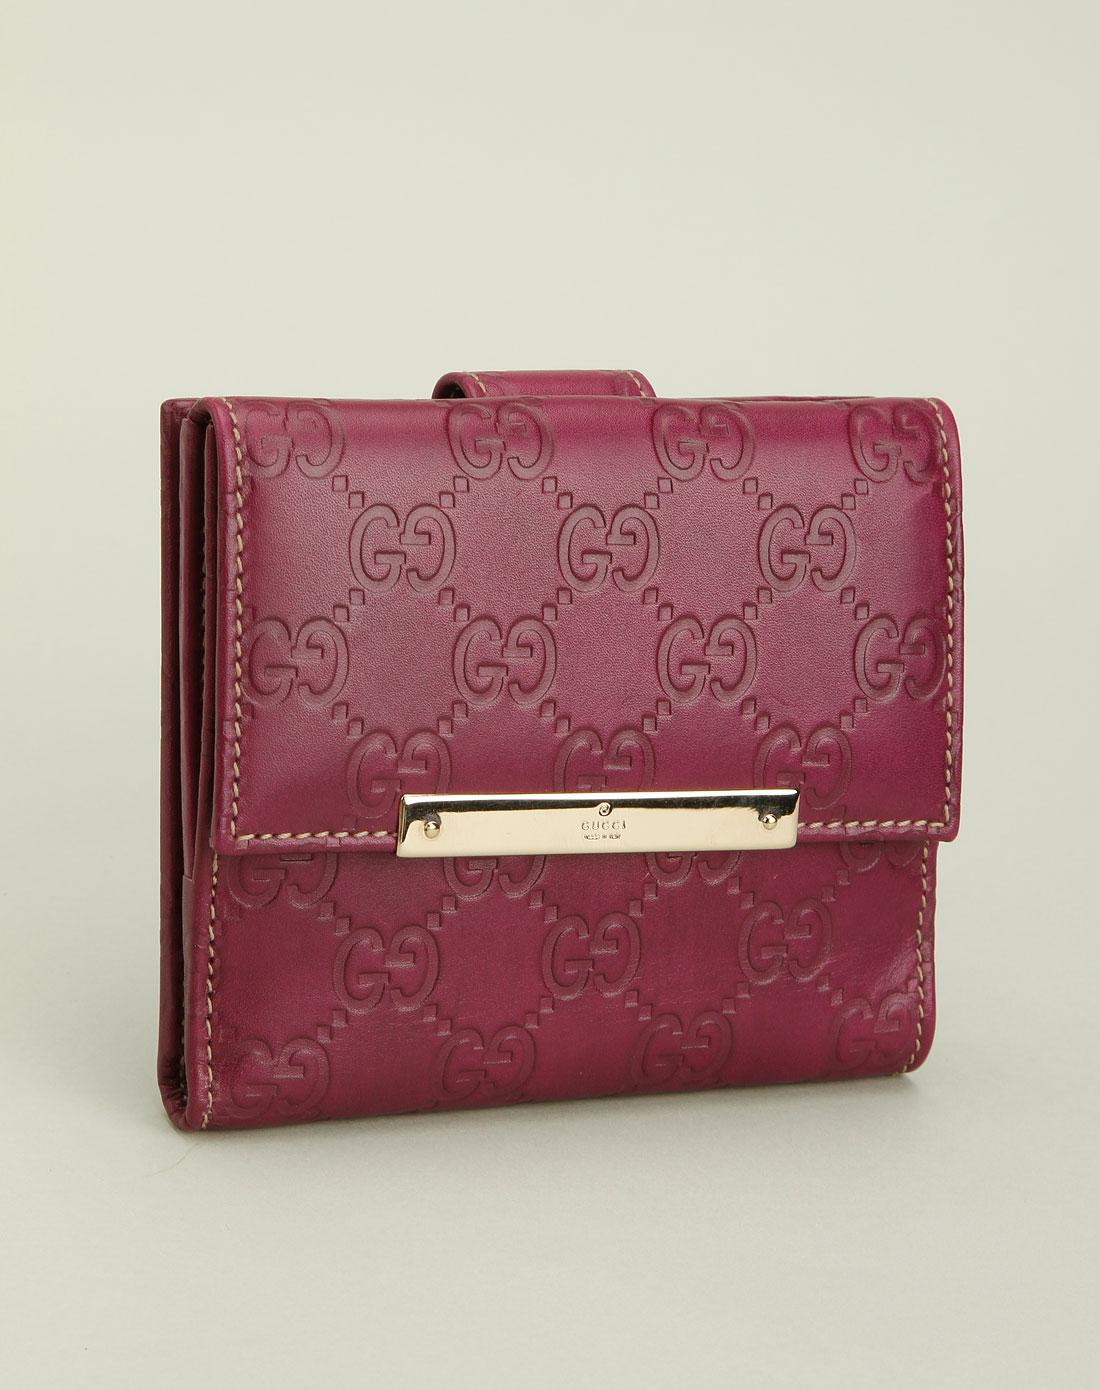 gucci钱包专场女款紫色印logo百搭钱包